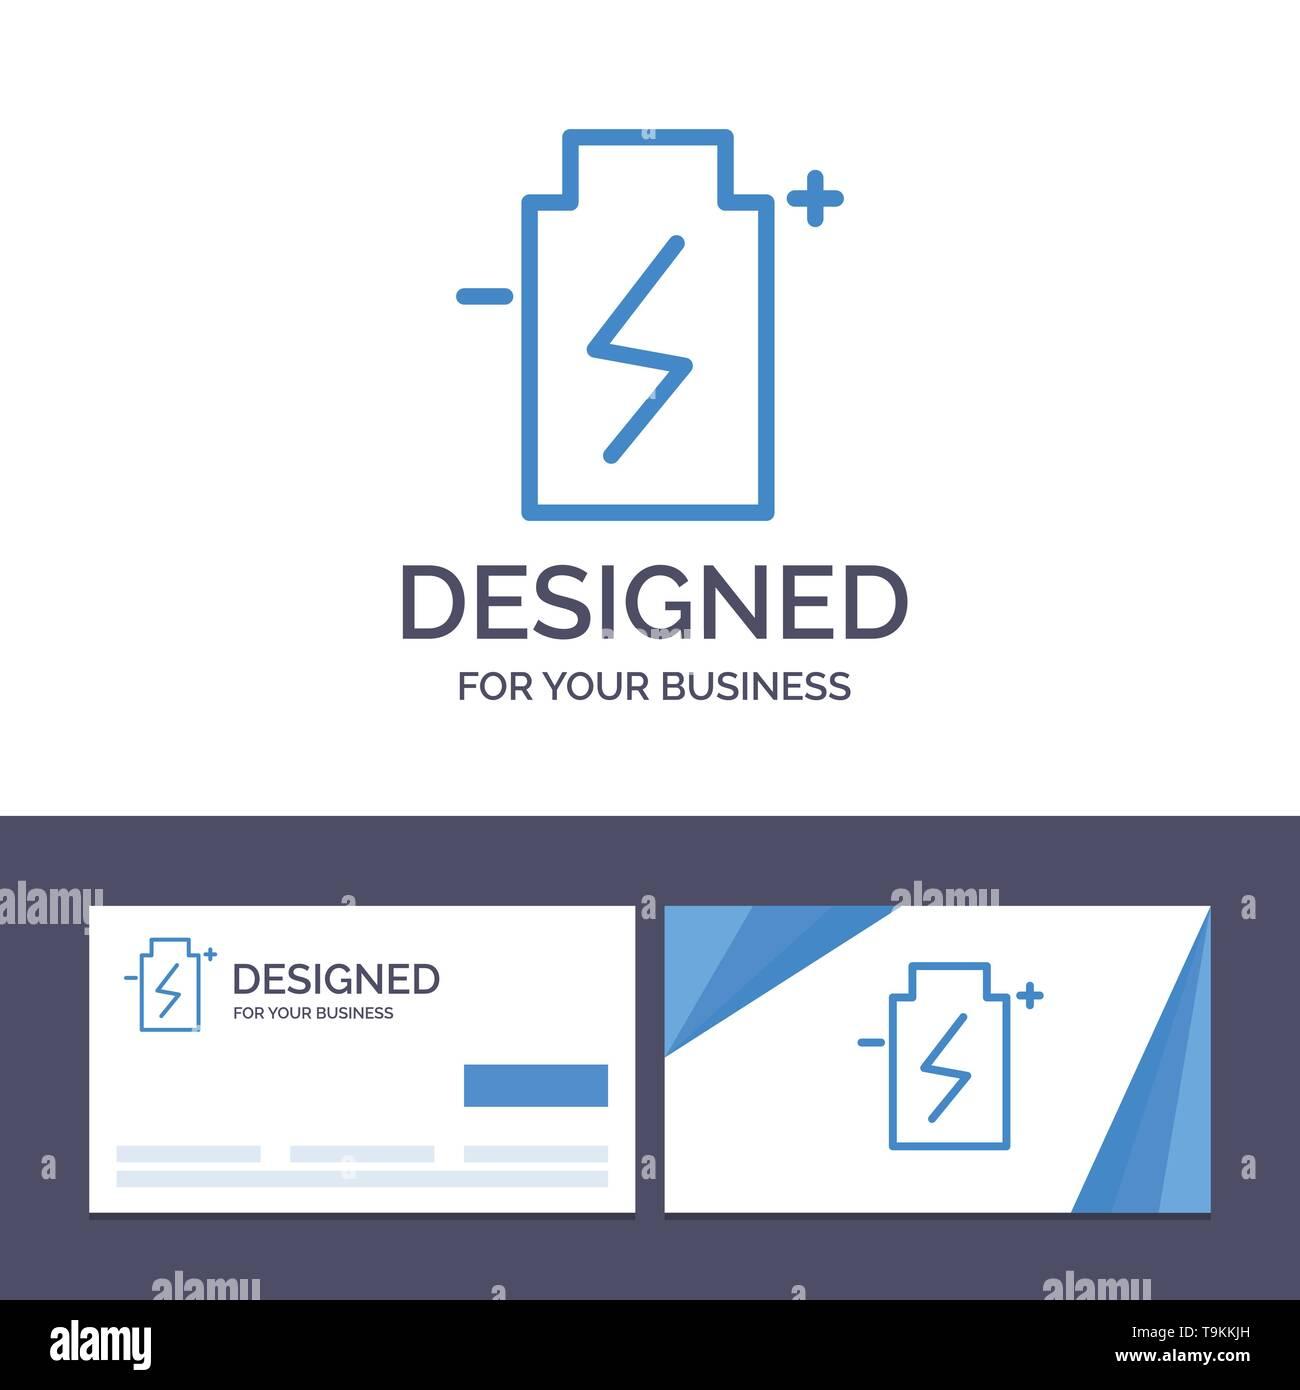 Creative Business Card und Logo Vorlage Batterie, Eco, Ökologie, Energie, Umwelt Vector Illustration Stockbild